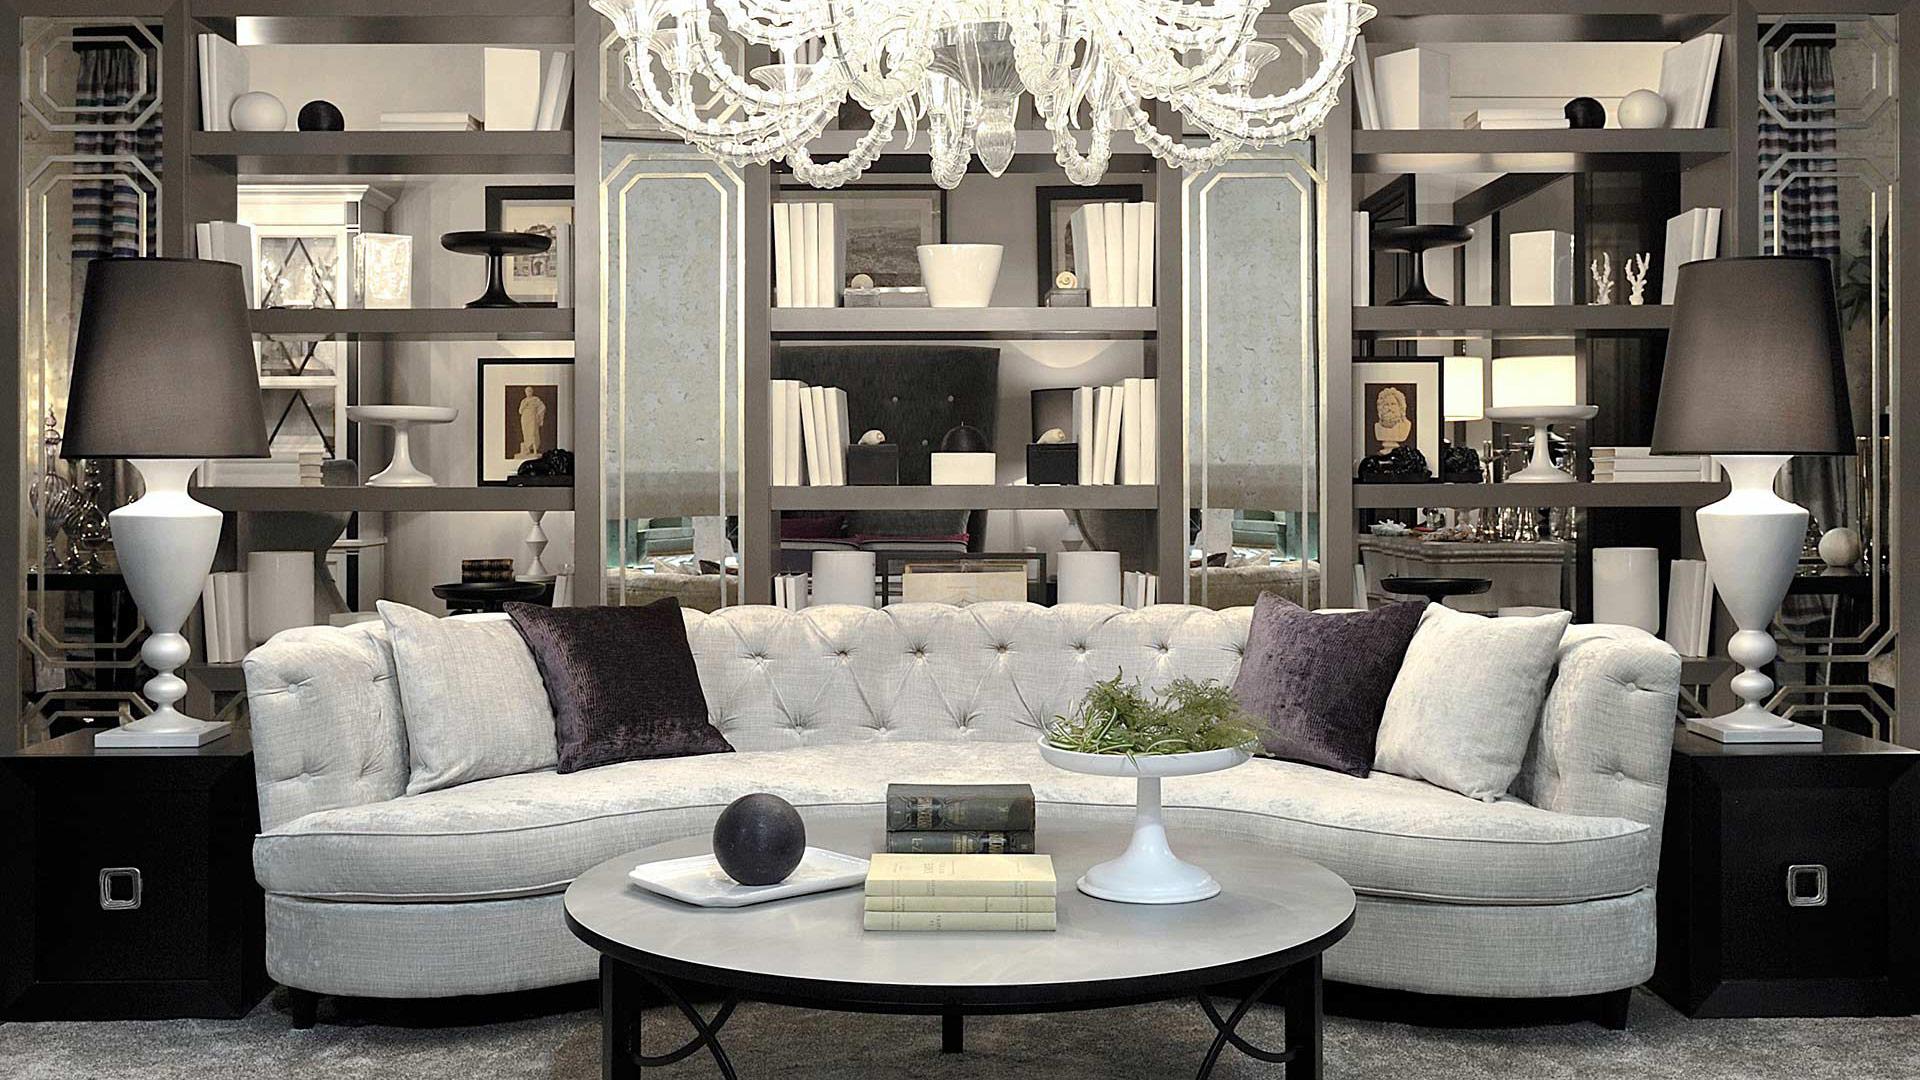 Living Room - Isabella Costantini